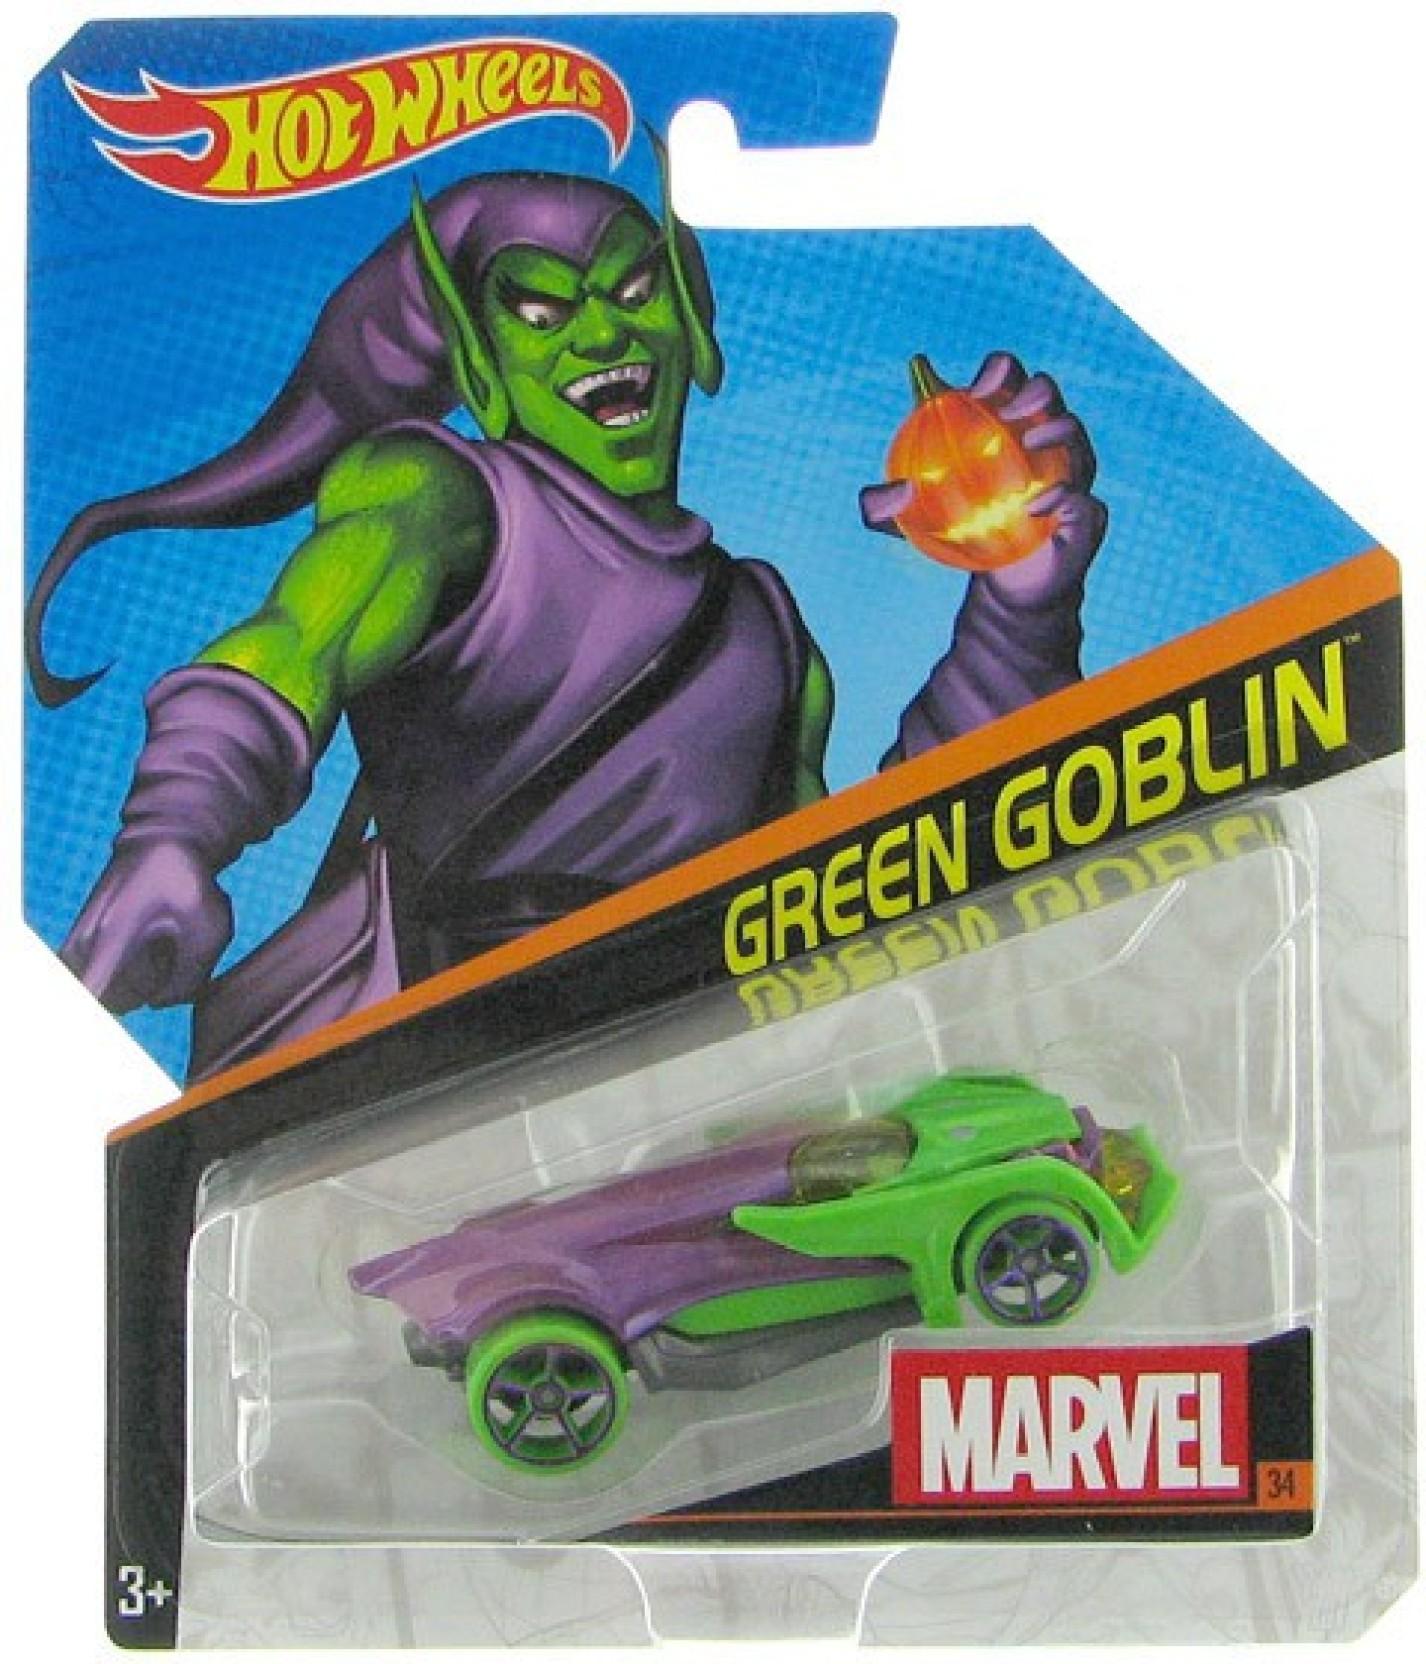 Hot Wheels Marvel Character Car Green Goblin Djj50 Hotwheels 12 Camaro Zl1 Share